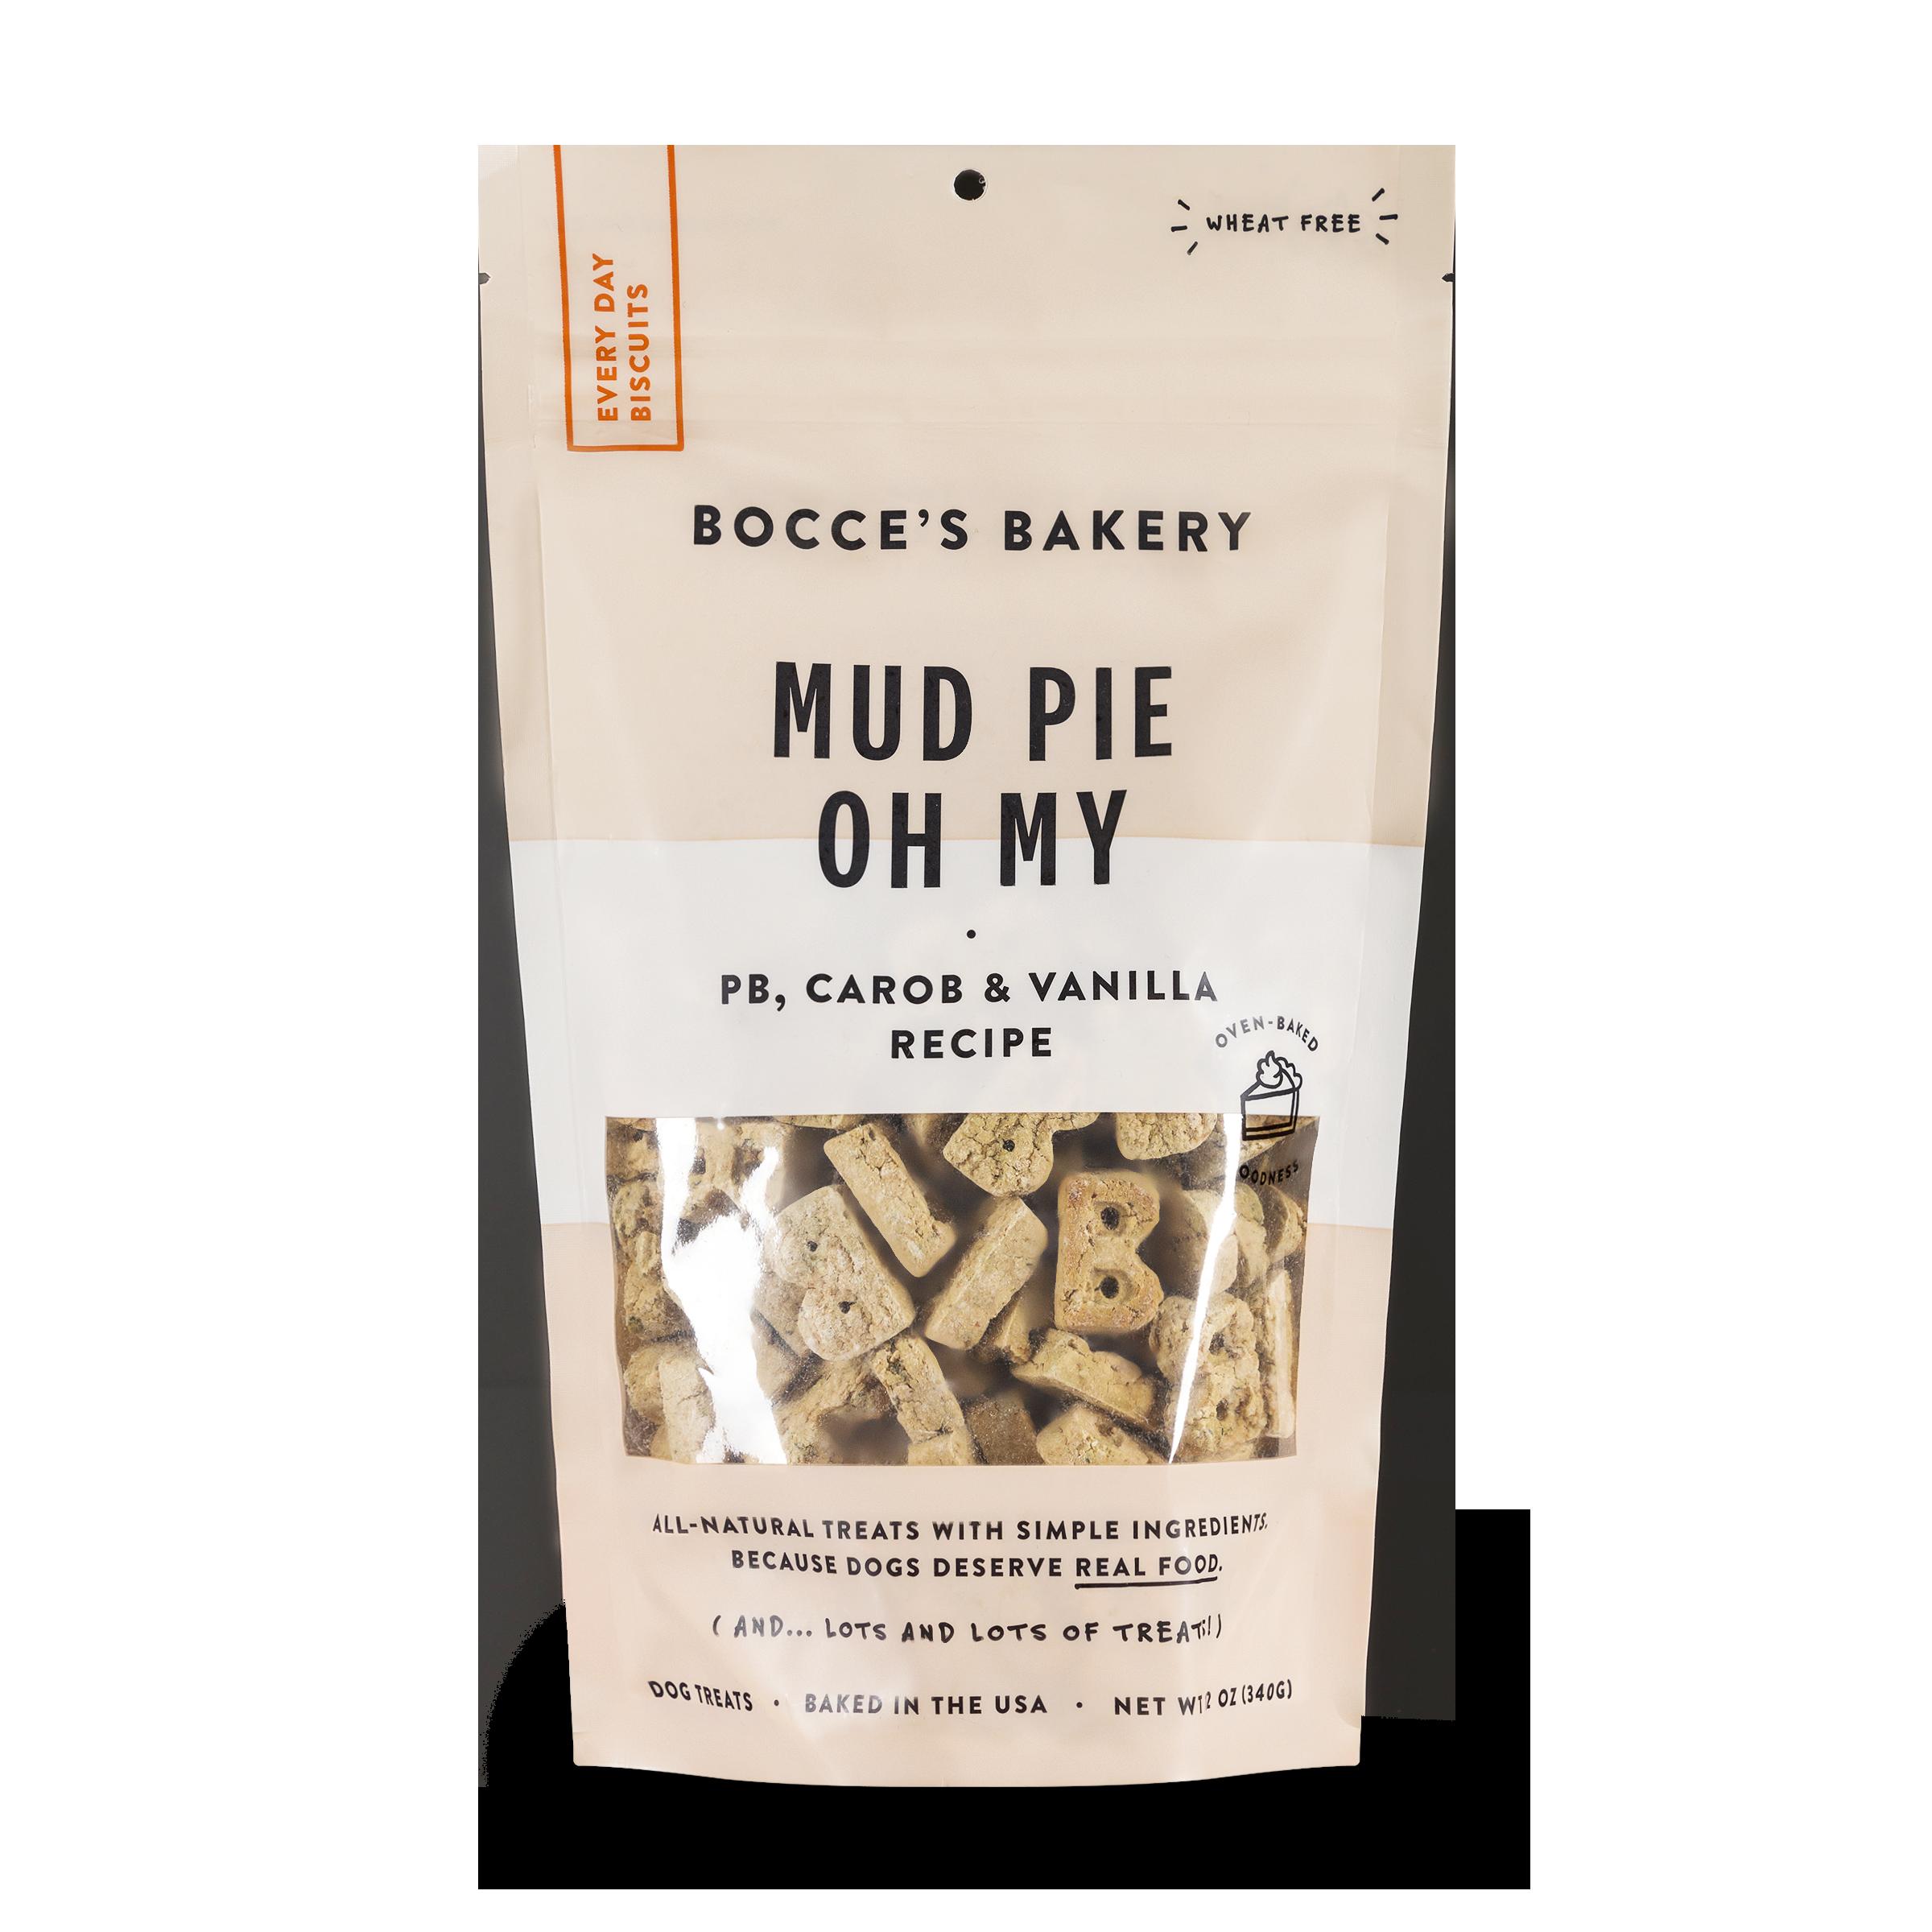 Bocce's Bakery Everyday Mud Pie Oh My Peanut Butter, Carob & Vanilla Recipe Biscuit Dog Treats, 12-oz